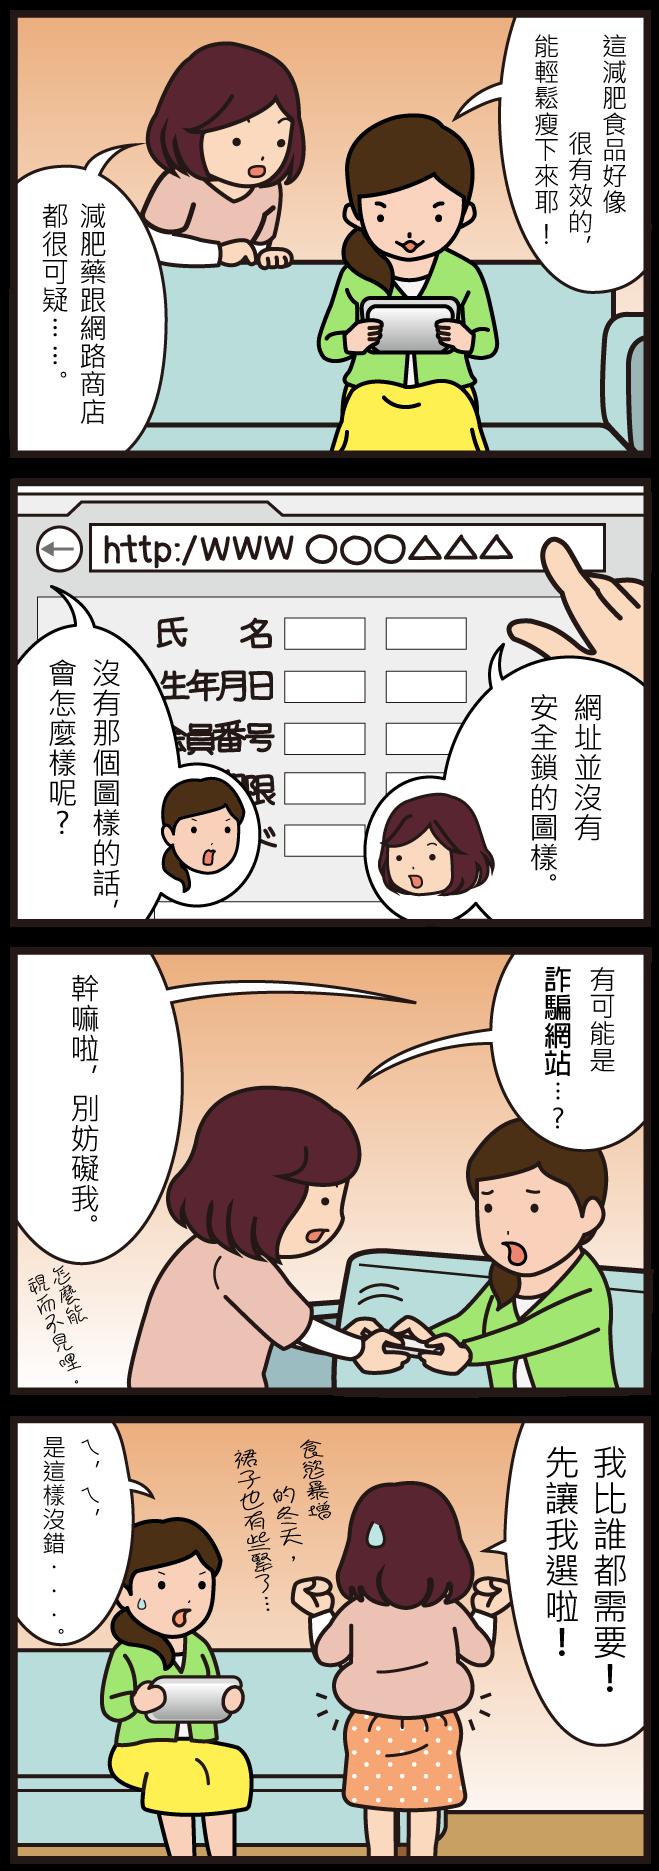 資安漫畫 https 27-all